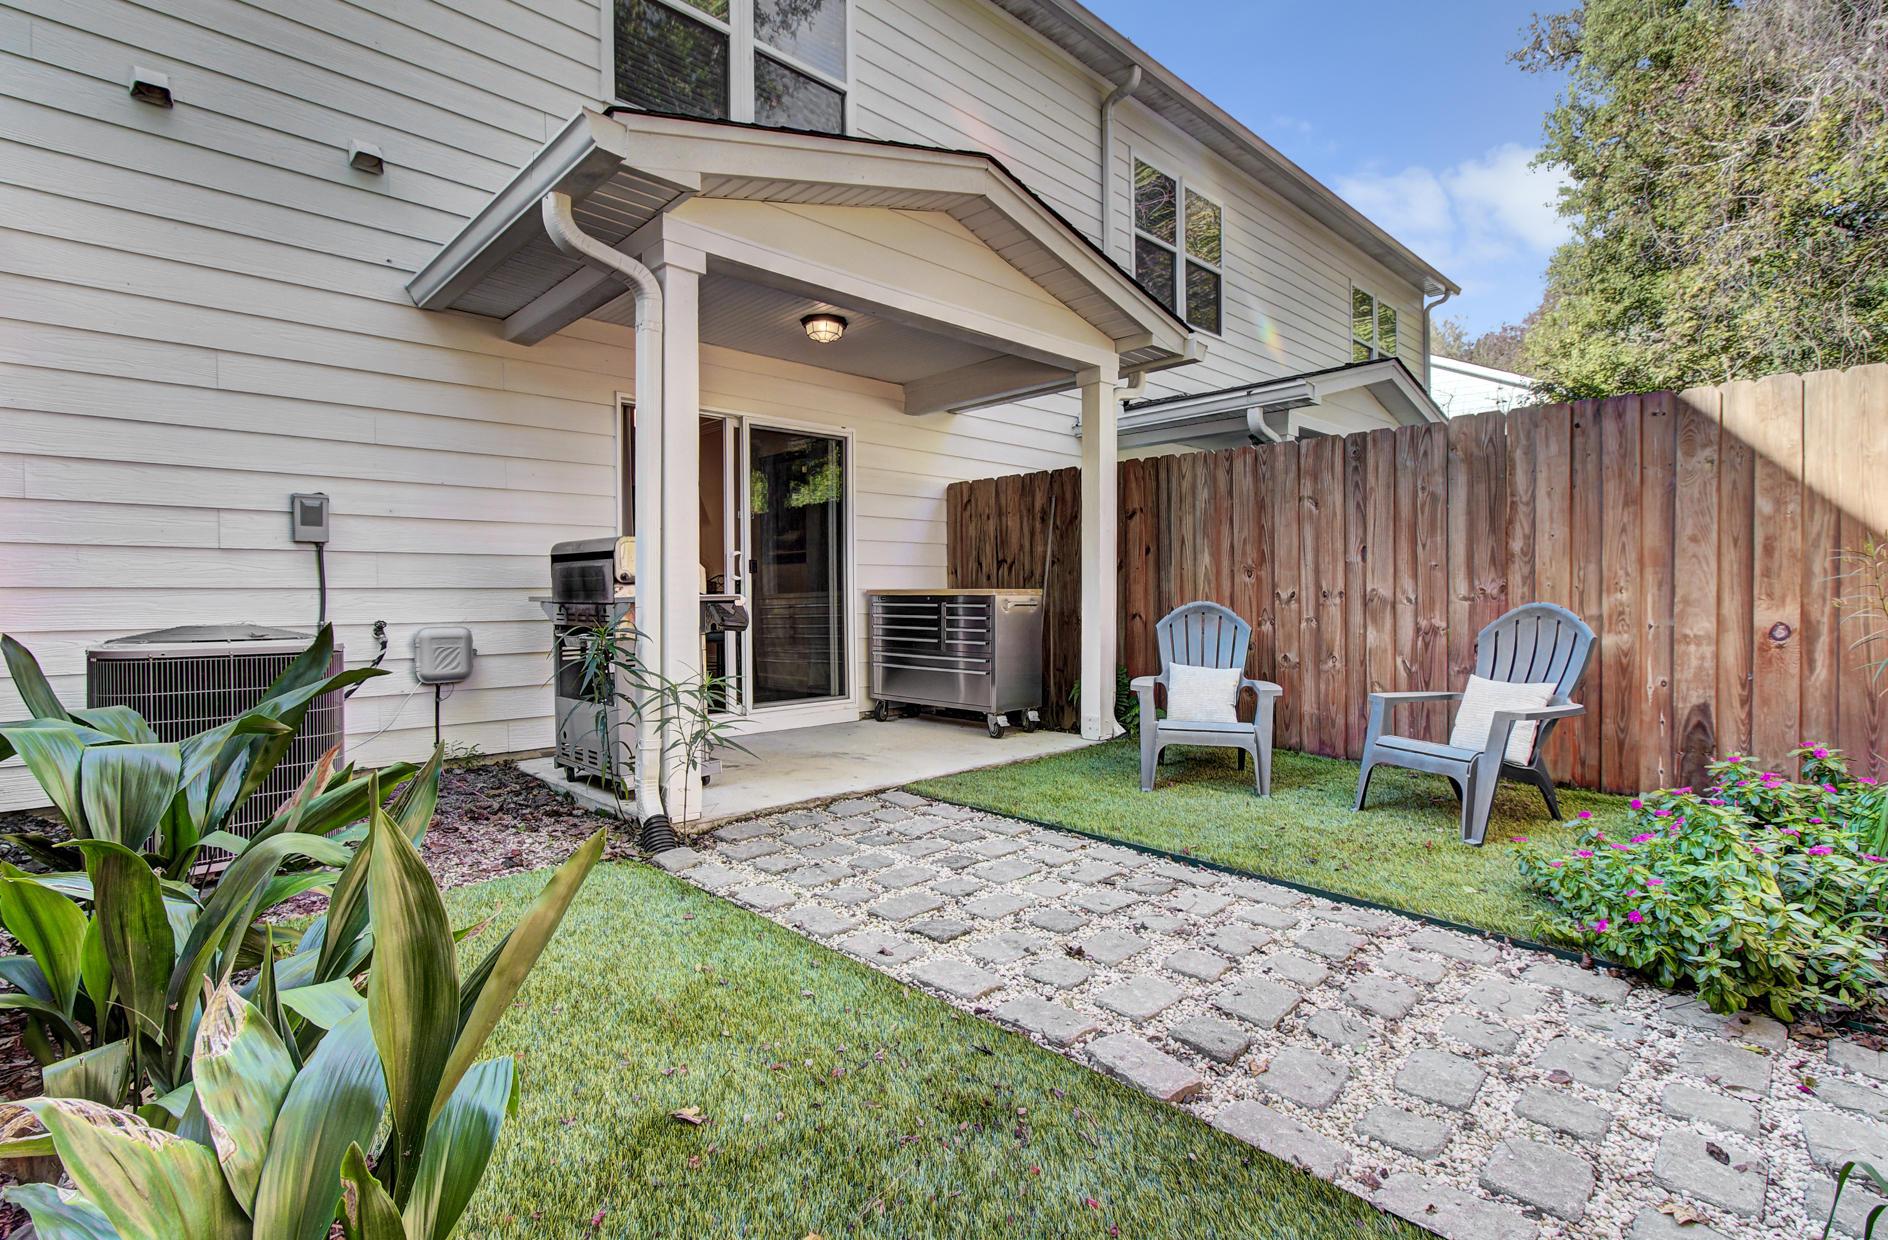 Carol Oaks Town Homes Homes For Sale - 2956 Emma, Mount Pleasant, SC - 25